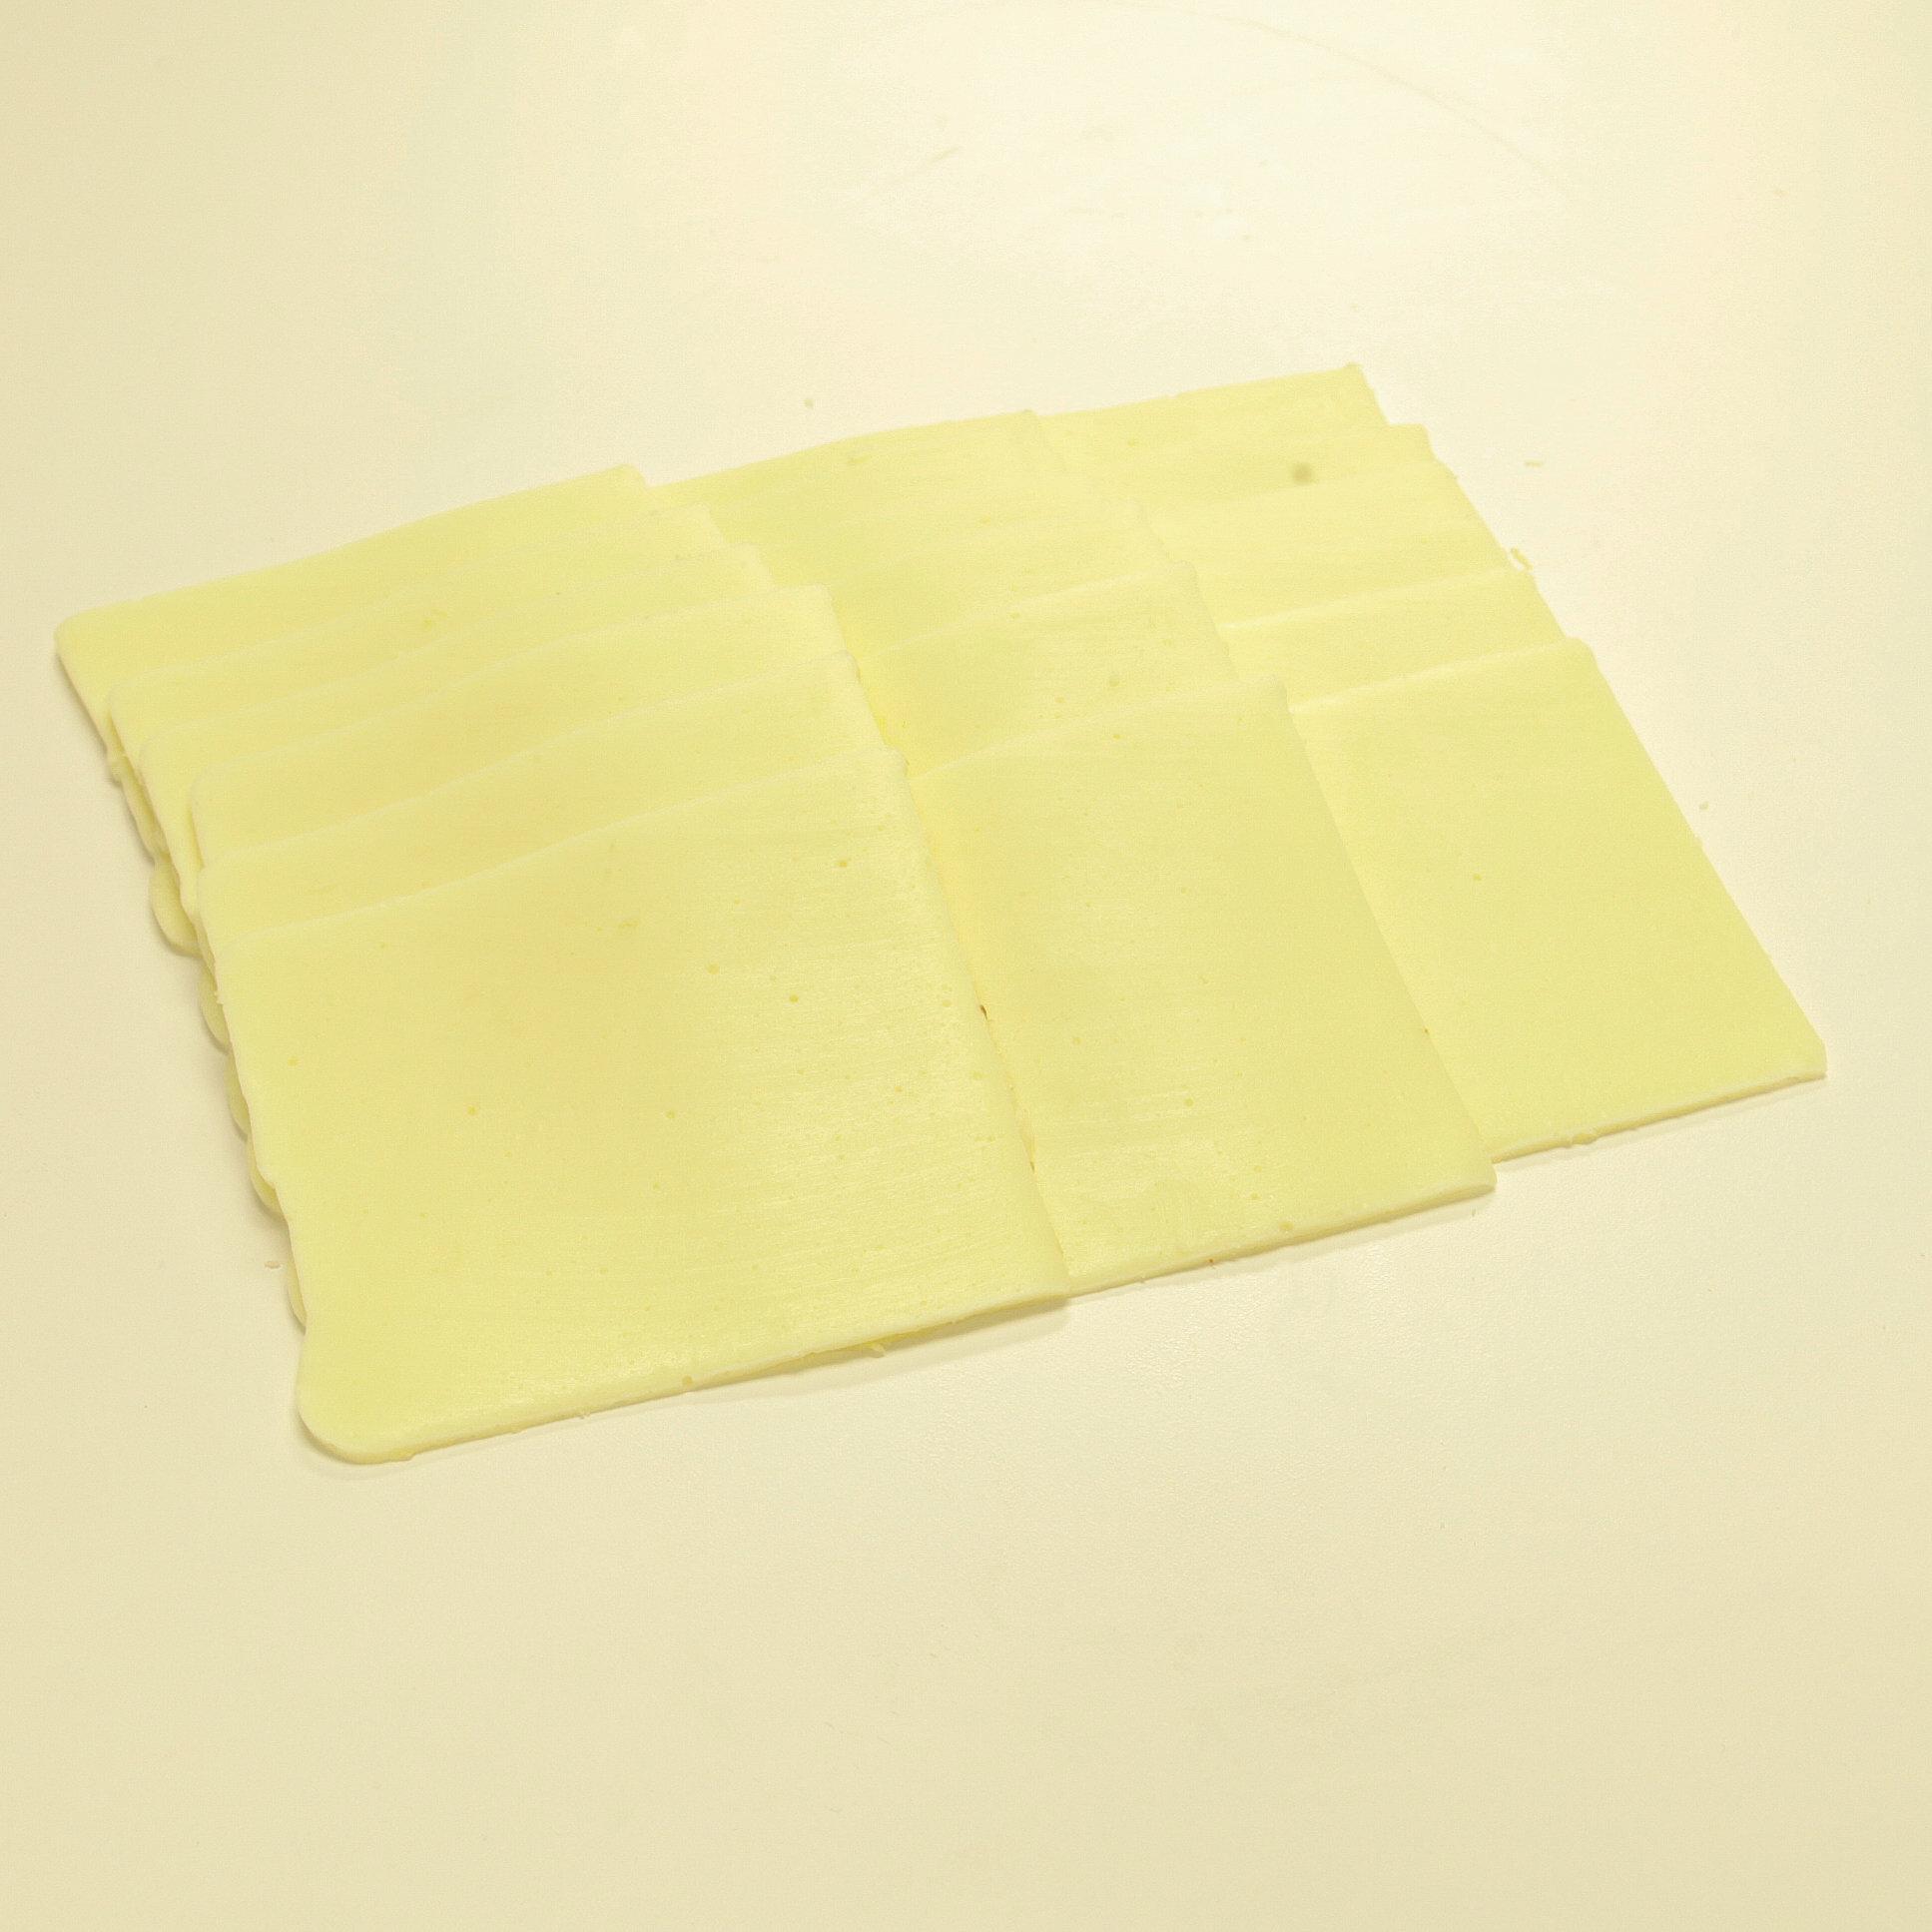 American Cheese (White), 16 oz. 00118